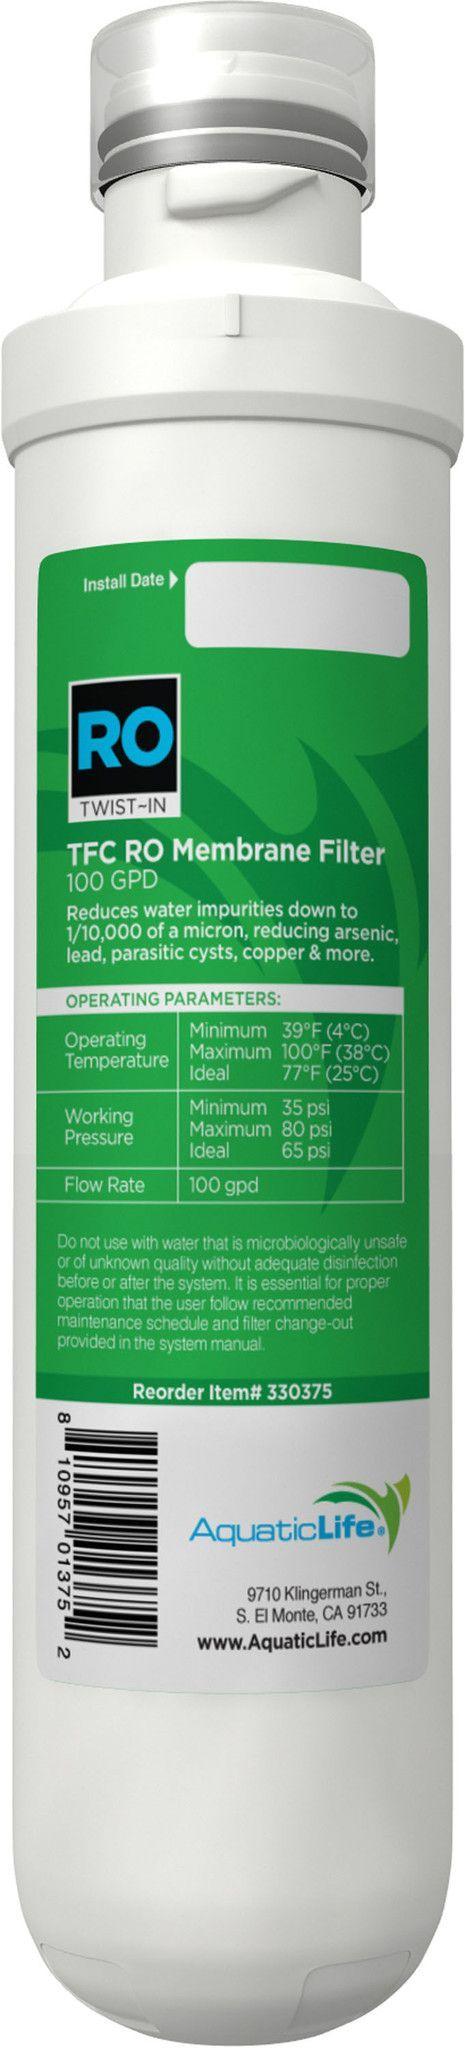 Twist-in Ro Membrane Filter